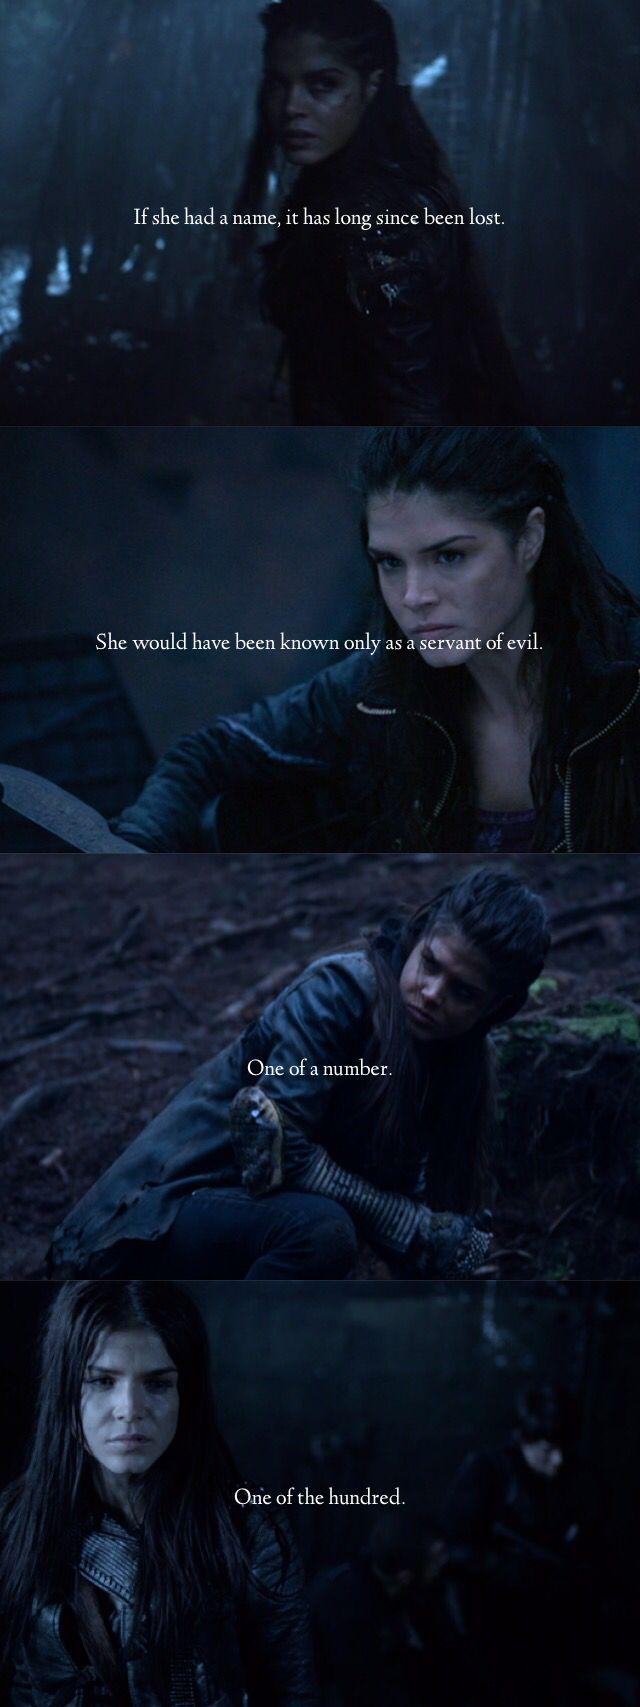 Octavia blake | Servant of evil